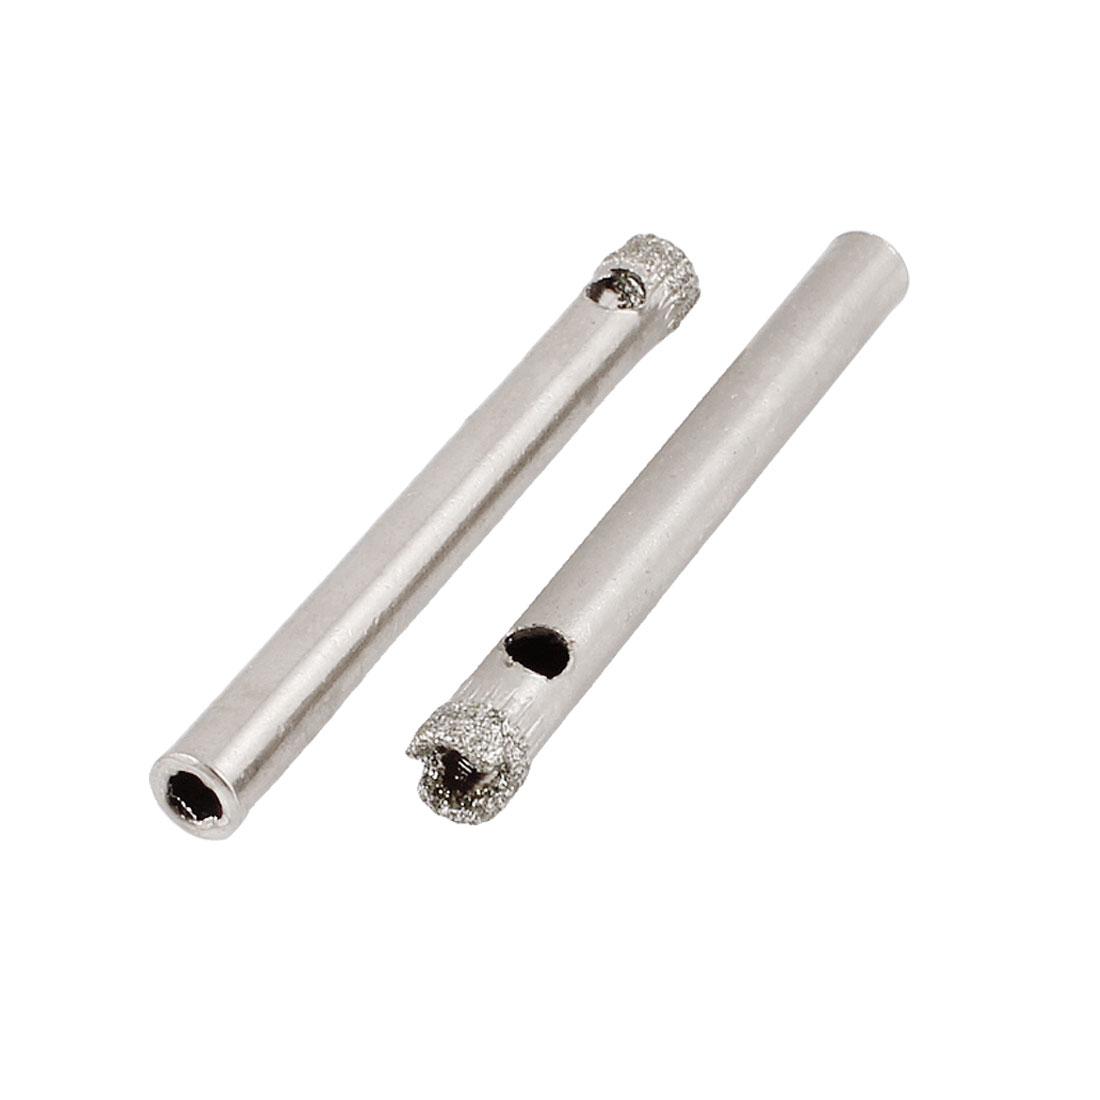 "Diamond Tool Drill Bit Ceramic Tile Glass Hole Saw 5mm 1/5"" 2 Pcs"